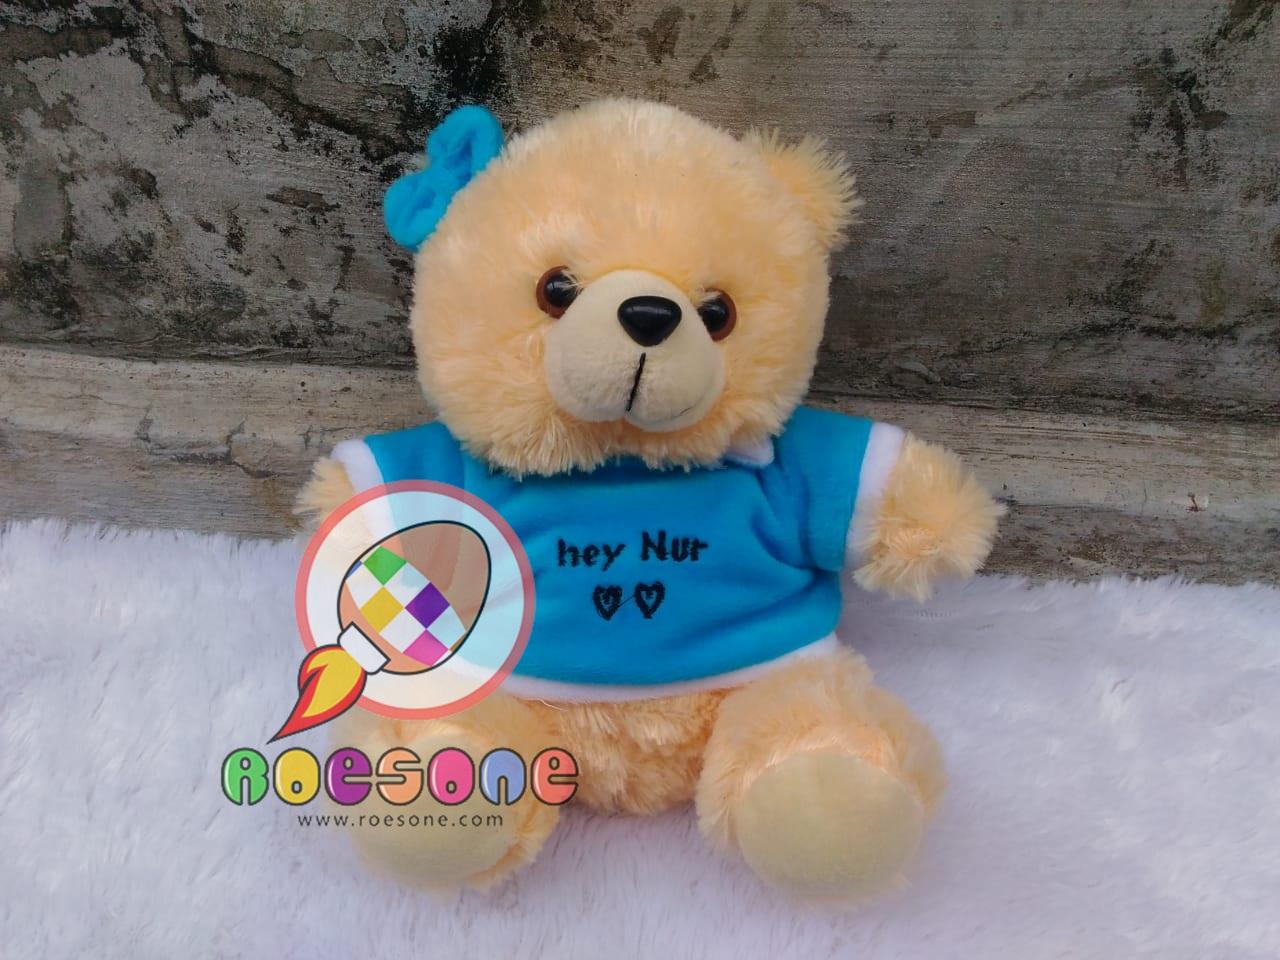 Produsen Boneka Teddy Bear Custom Murah